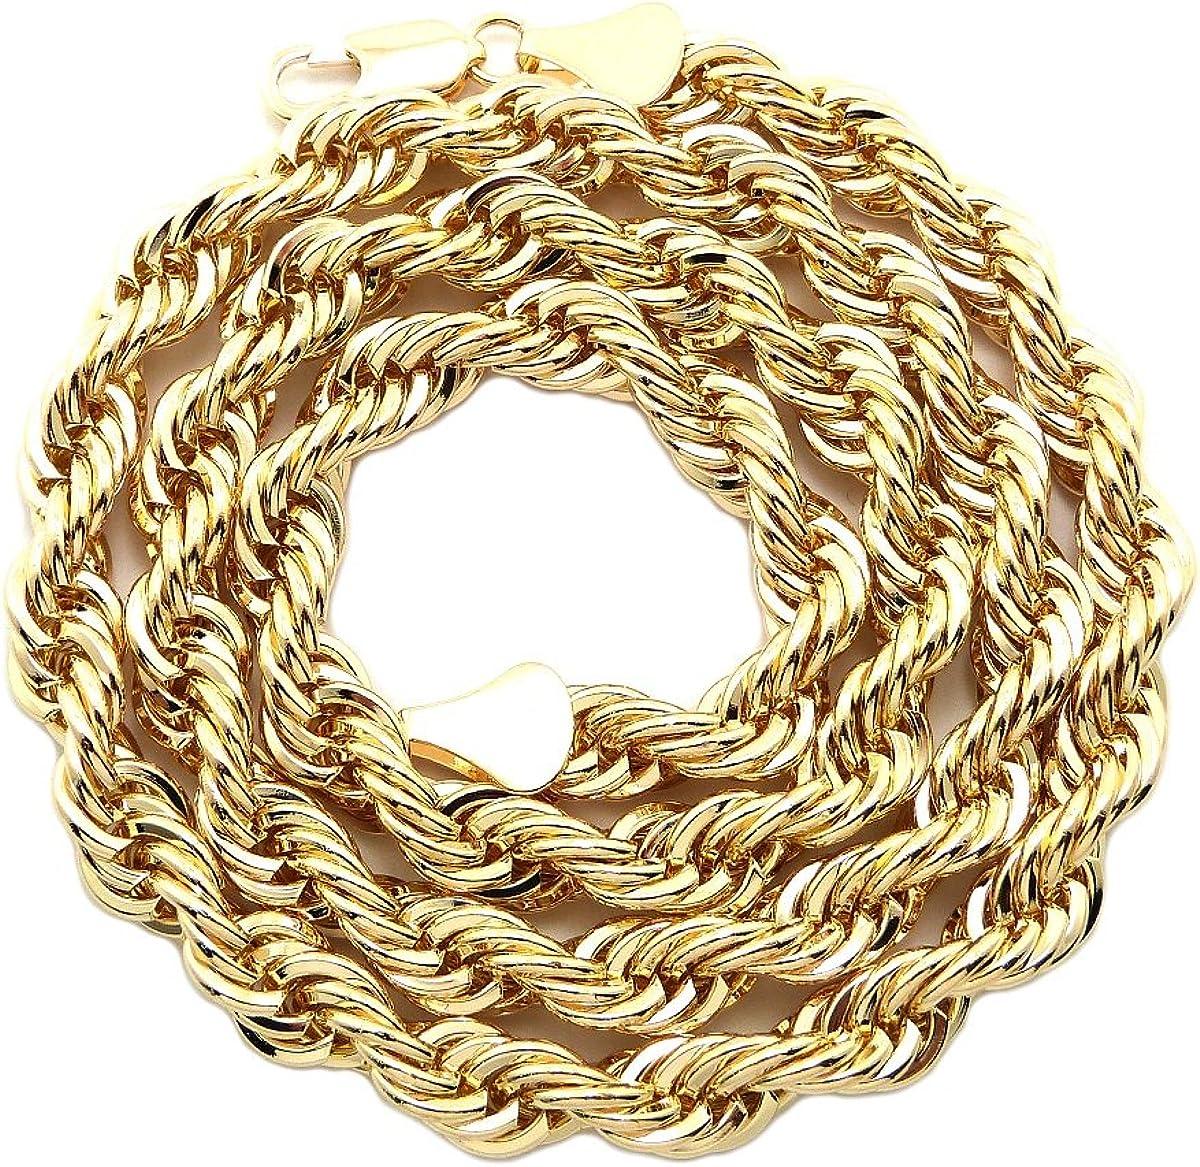 Gold-Tone 1.6-24 NYFASHION101 8.3mm 24 Unisex Hip-Hop Fashion Rope Chain Necklace